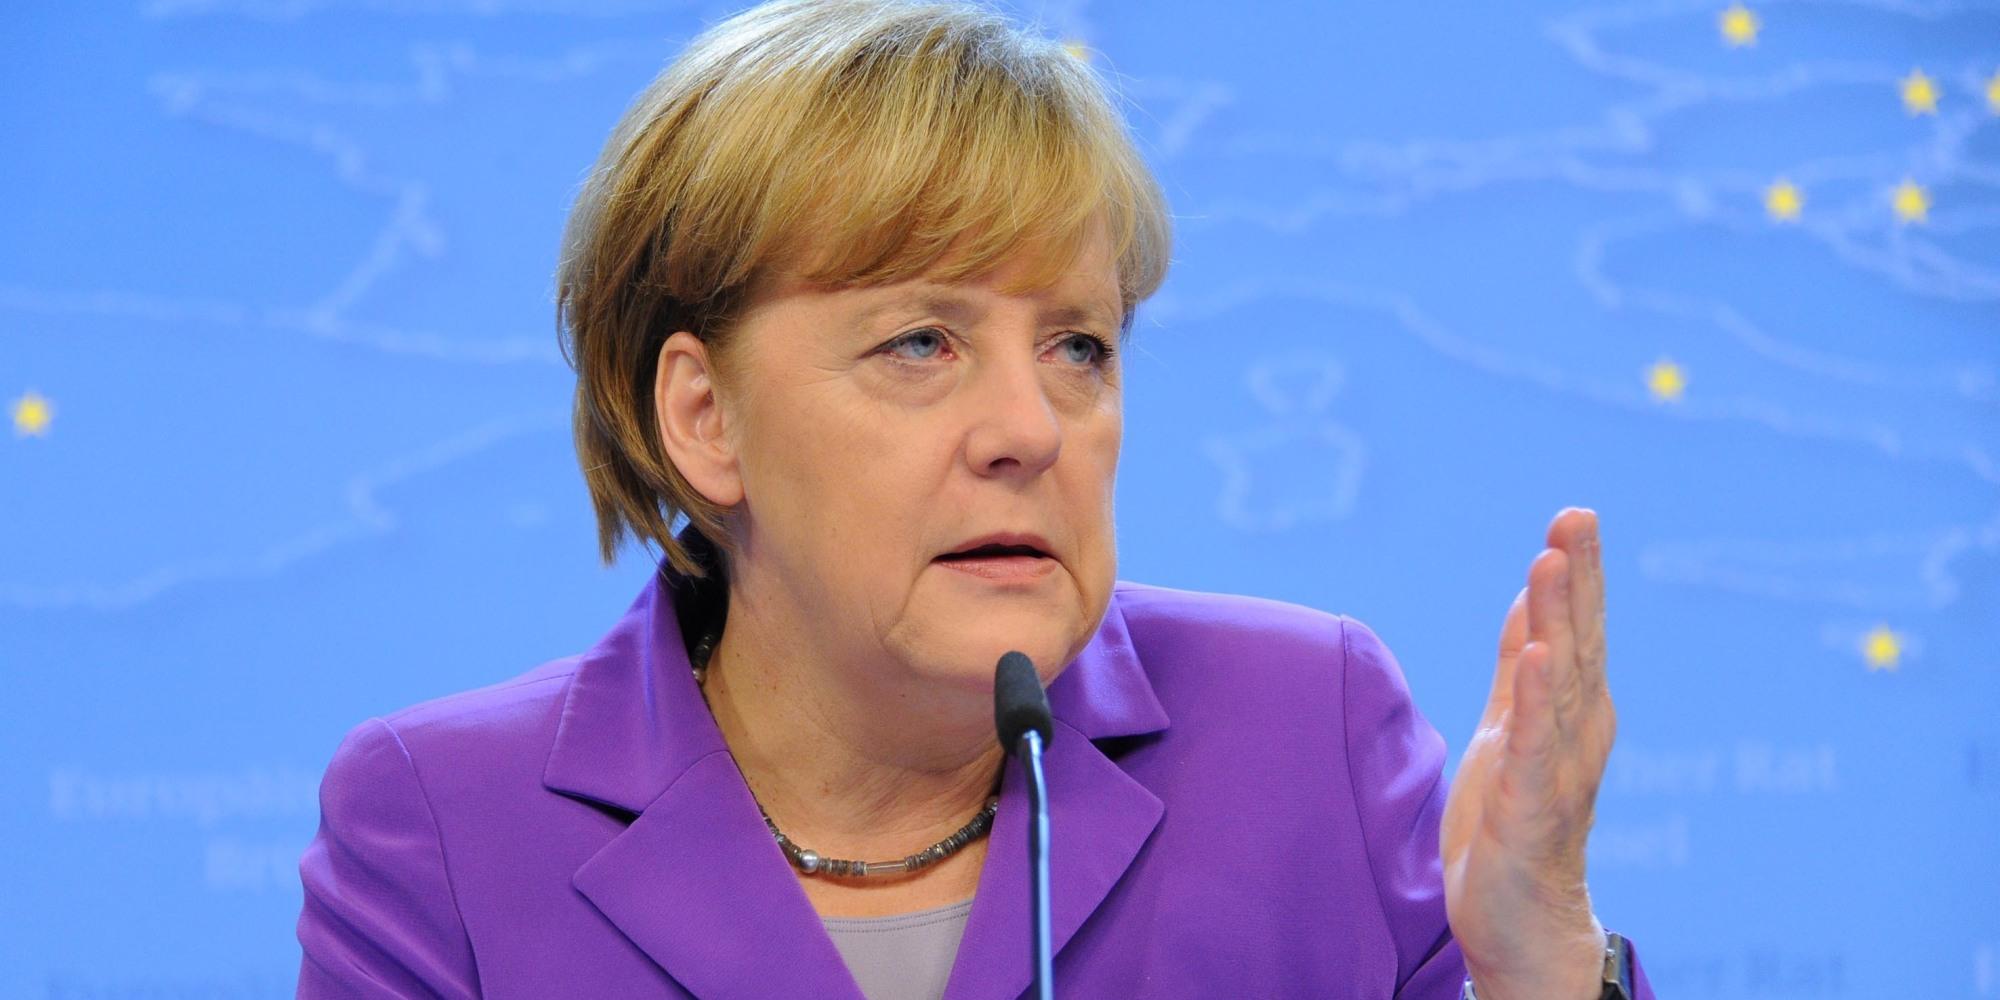 Angela Merkel su strage Mediterraneo: 'Immagini inconciliabili con i valori UE'